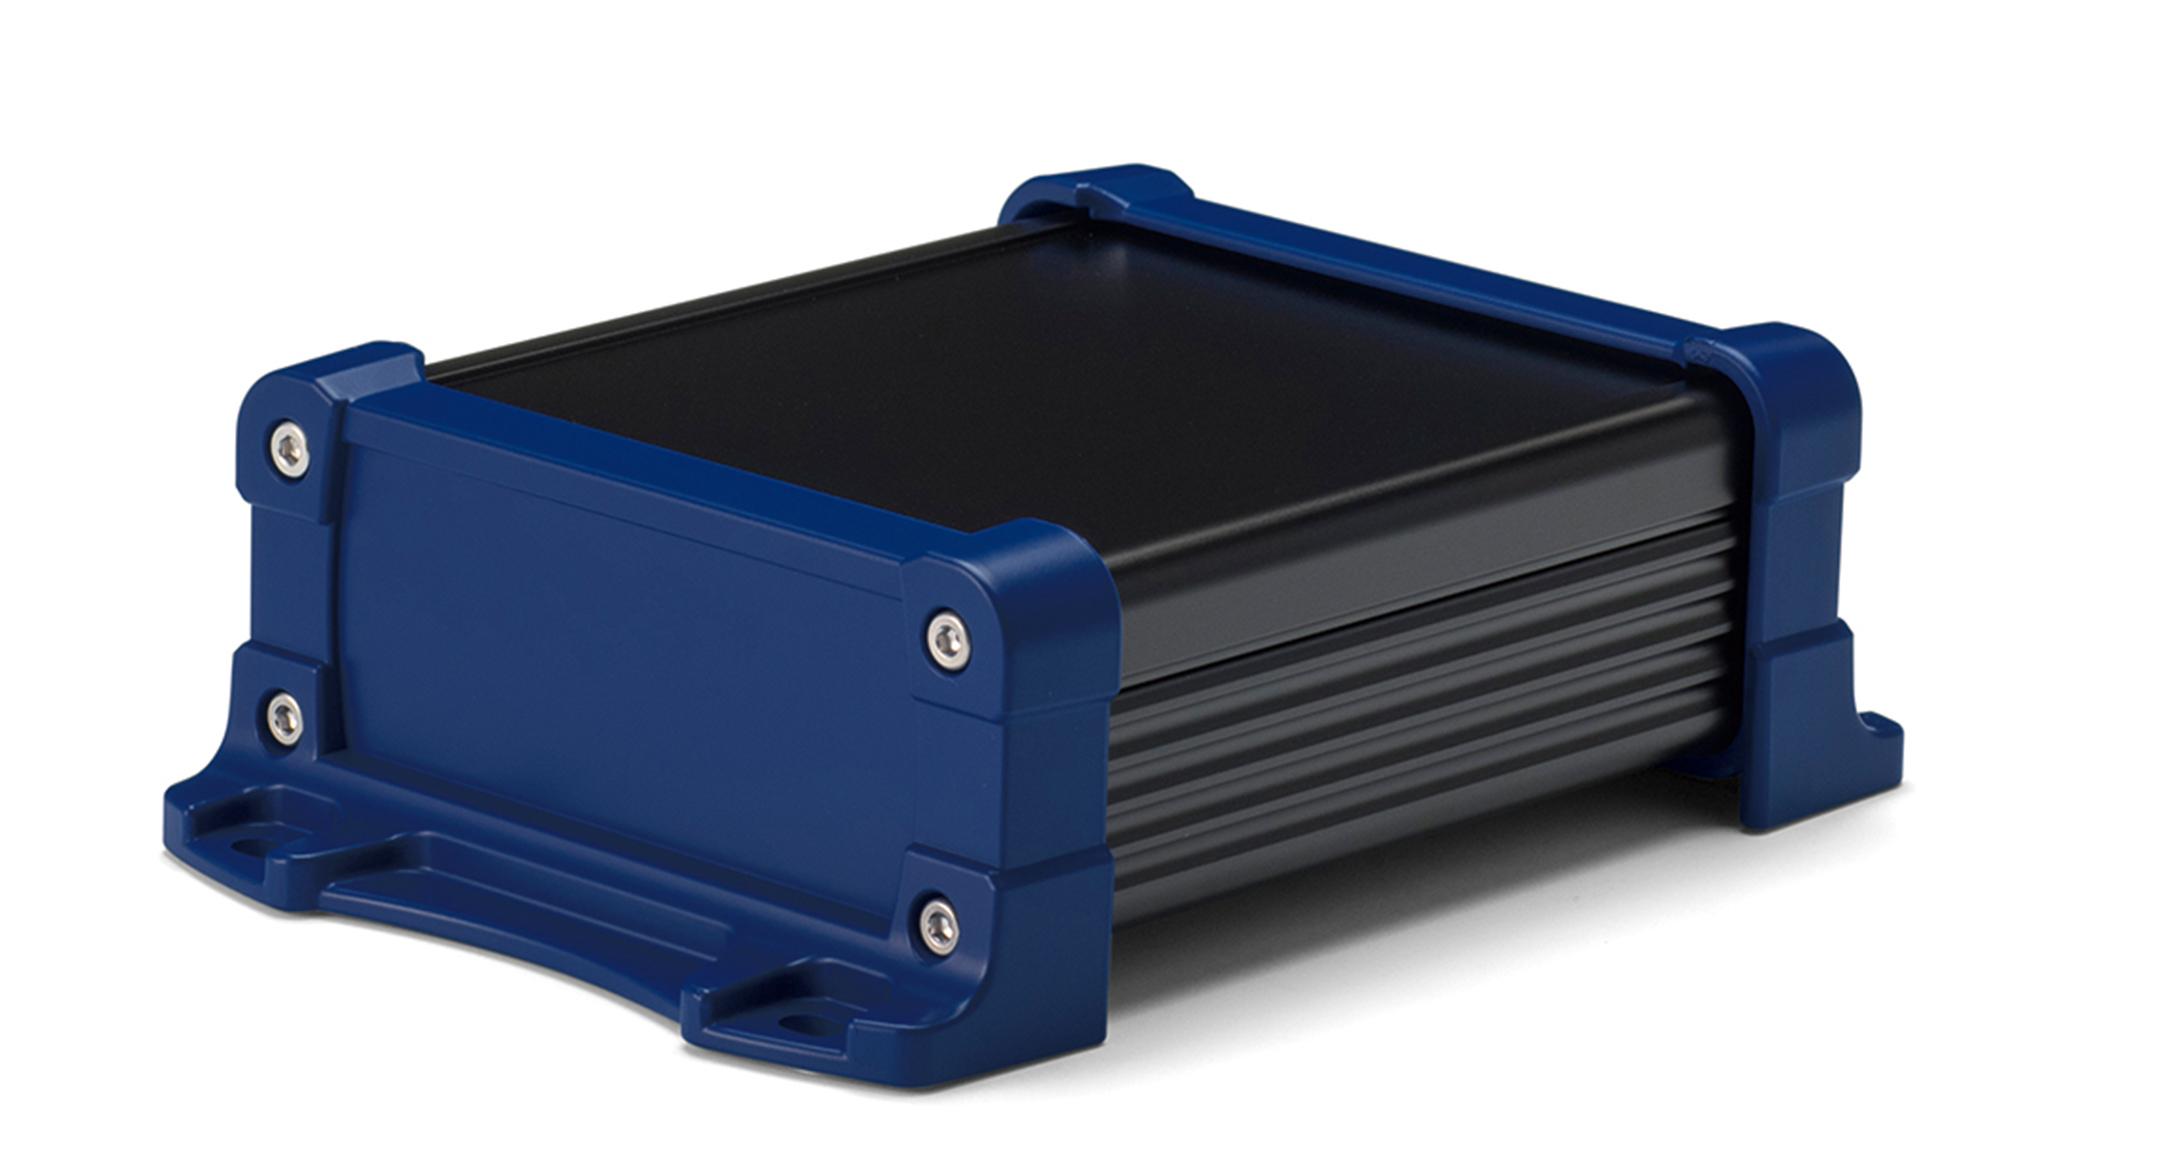 IP65防水 フランジ足付フリーサイズケース EXWFSシリーズ:ブラック/ネイビーの画像